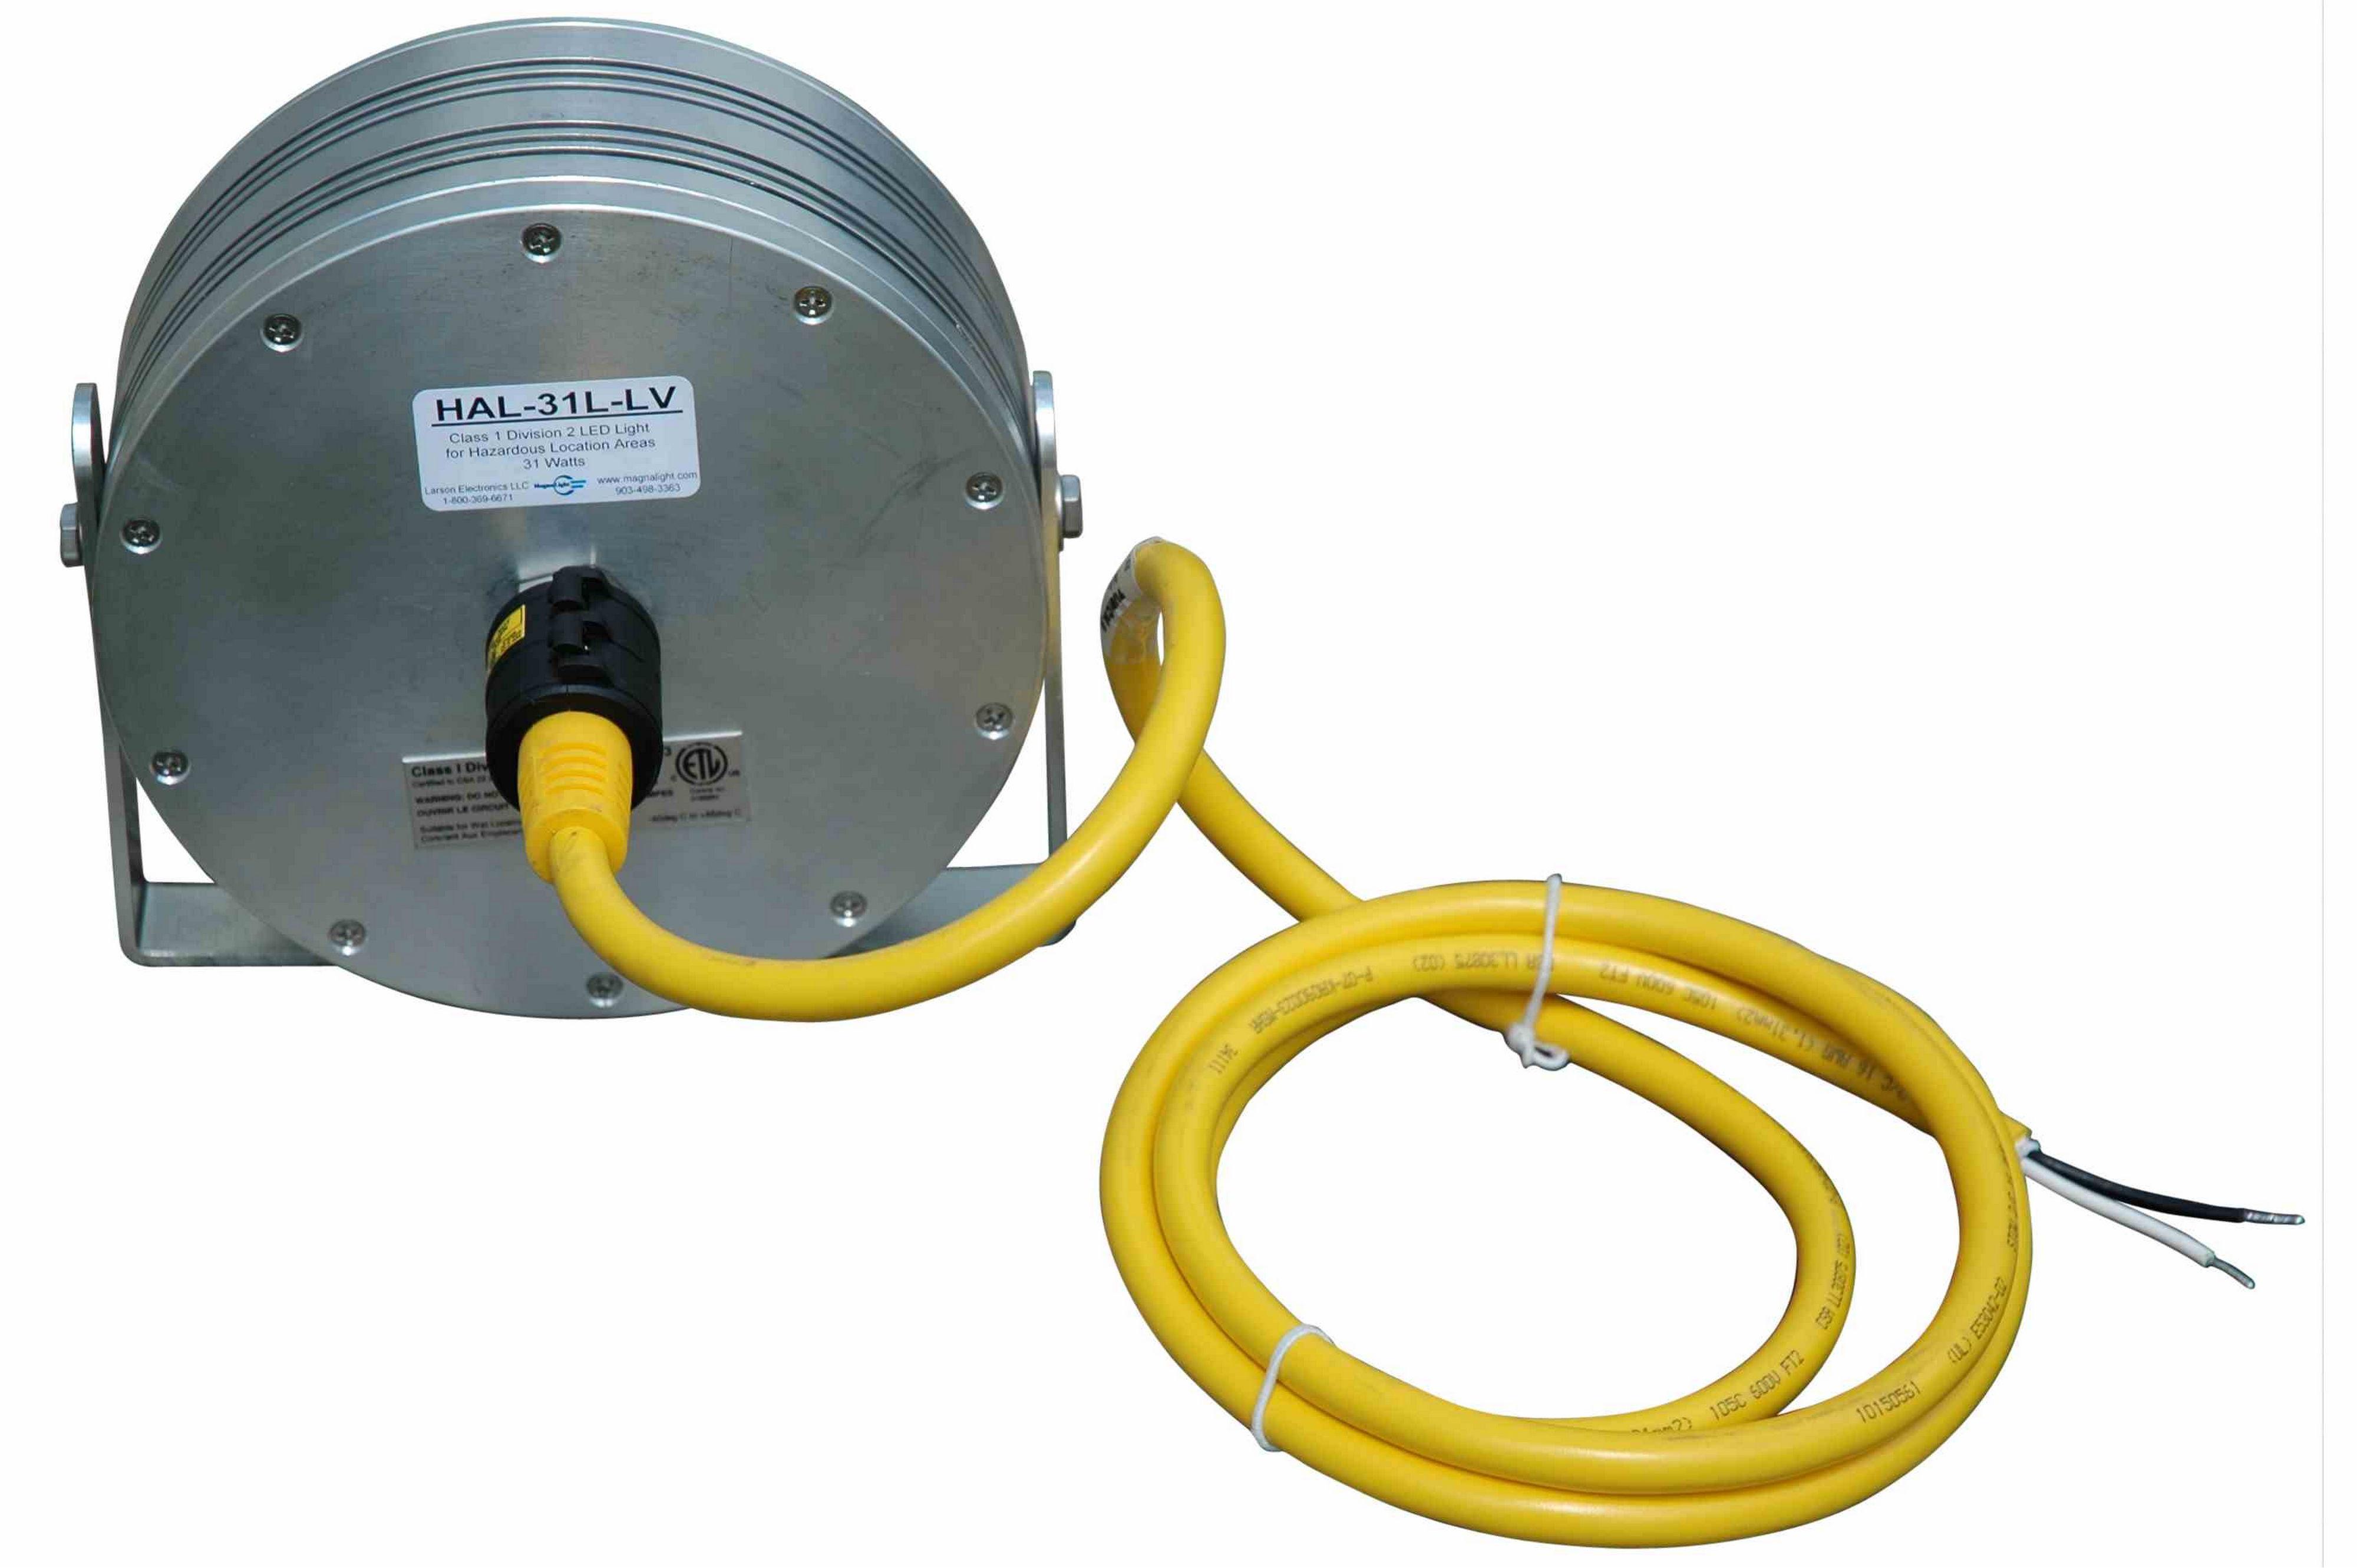 31 Watt Low Voltage LED Fixture for Hazardous Location Lighting ...